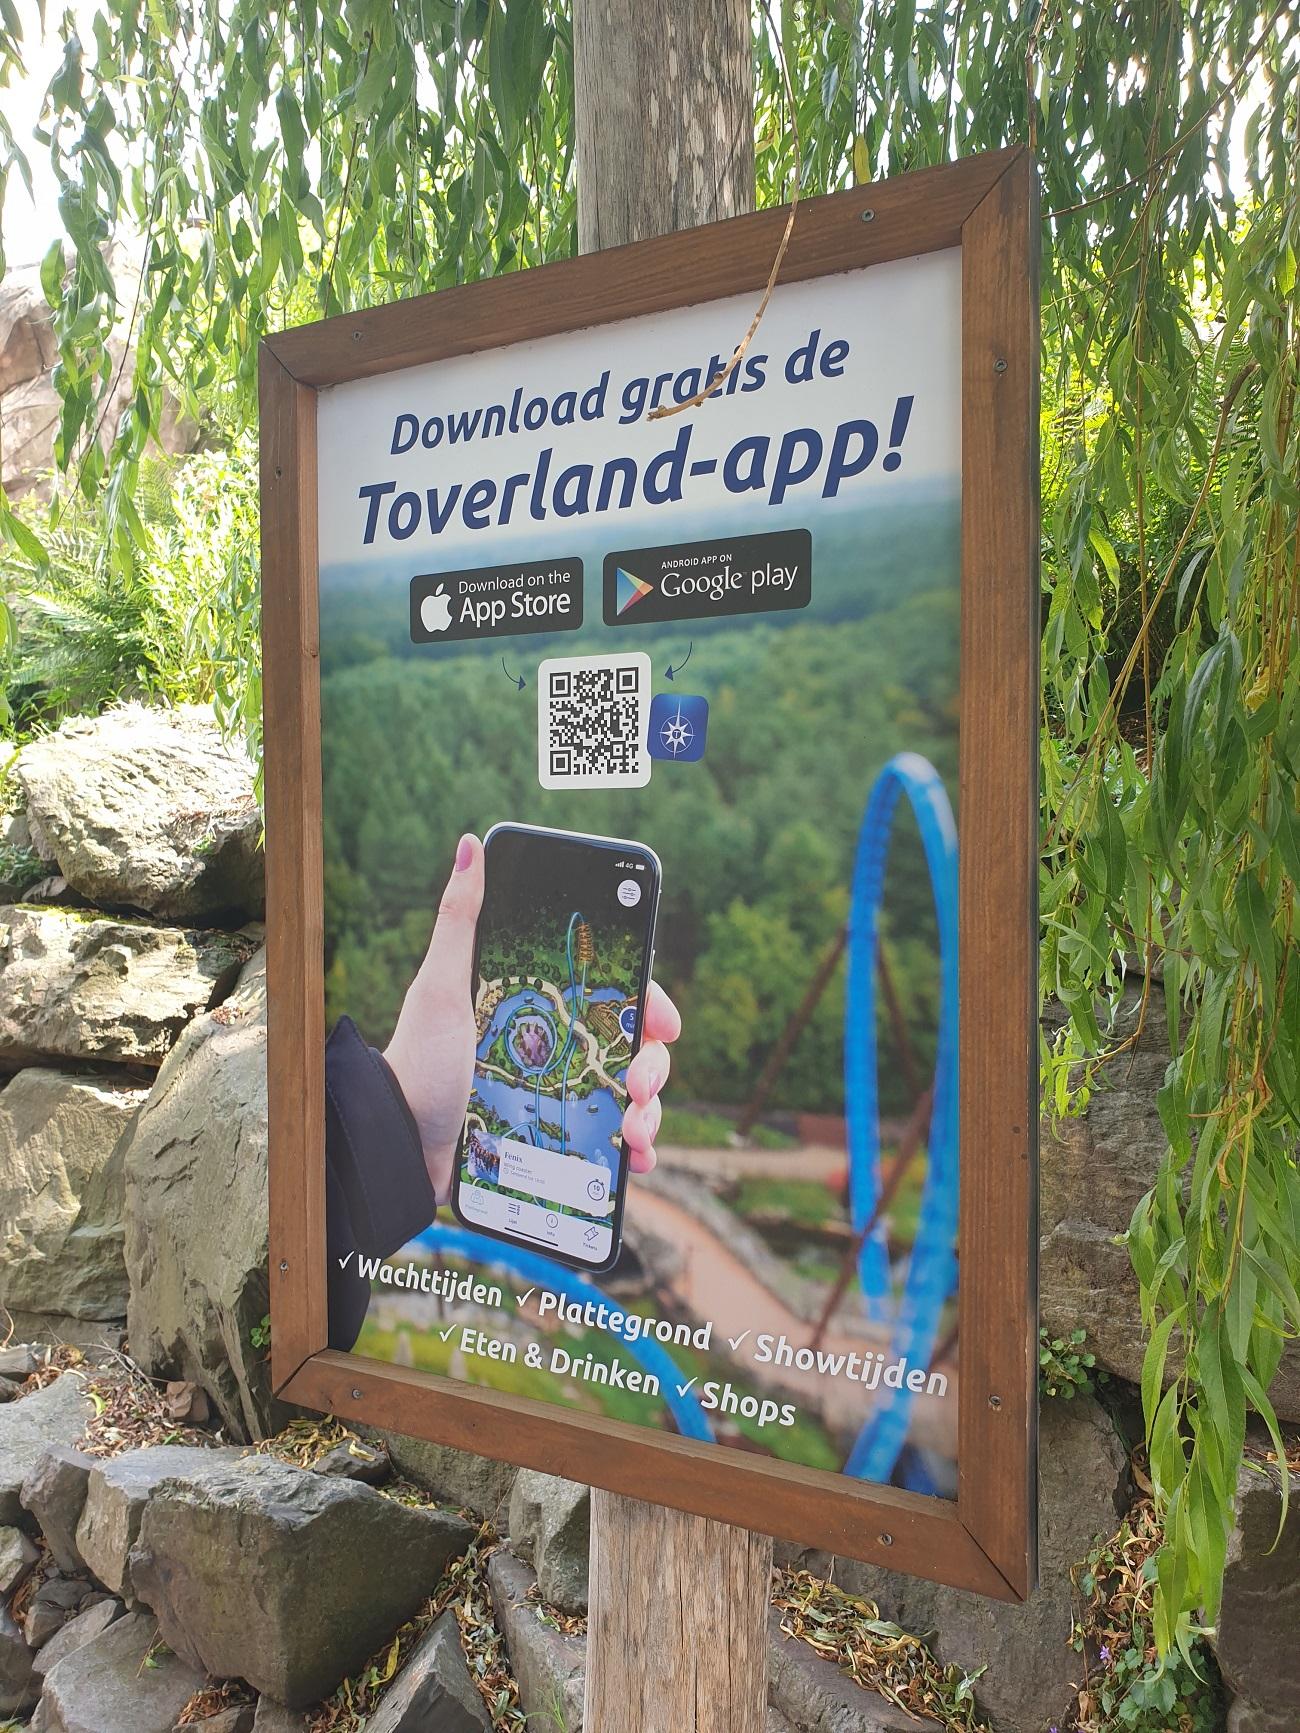 Toverland-app